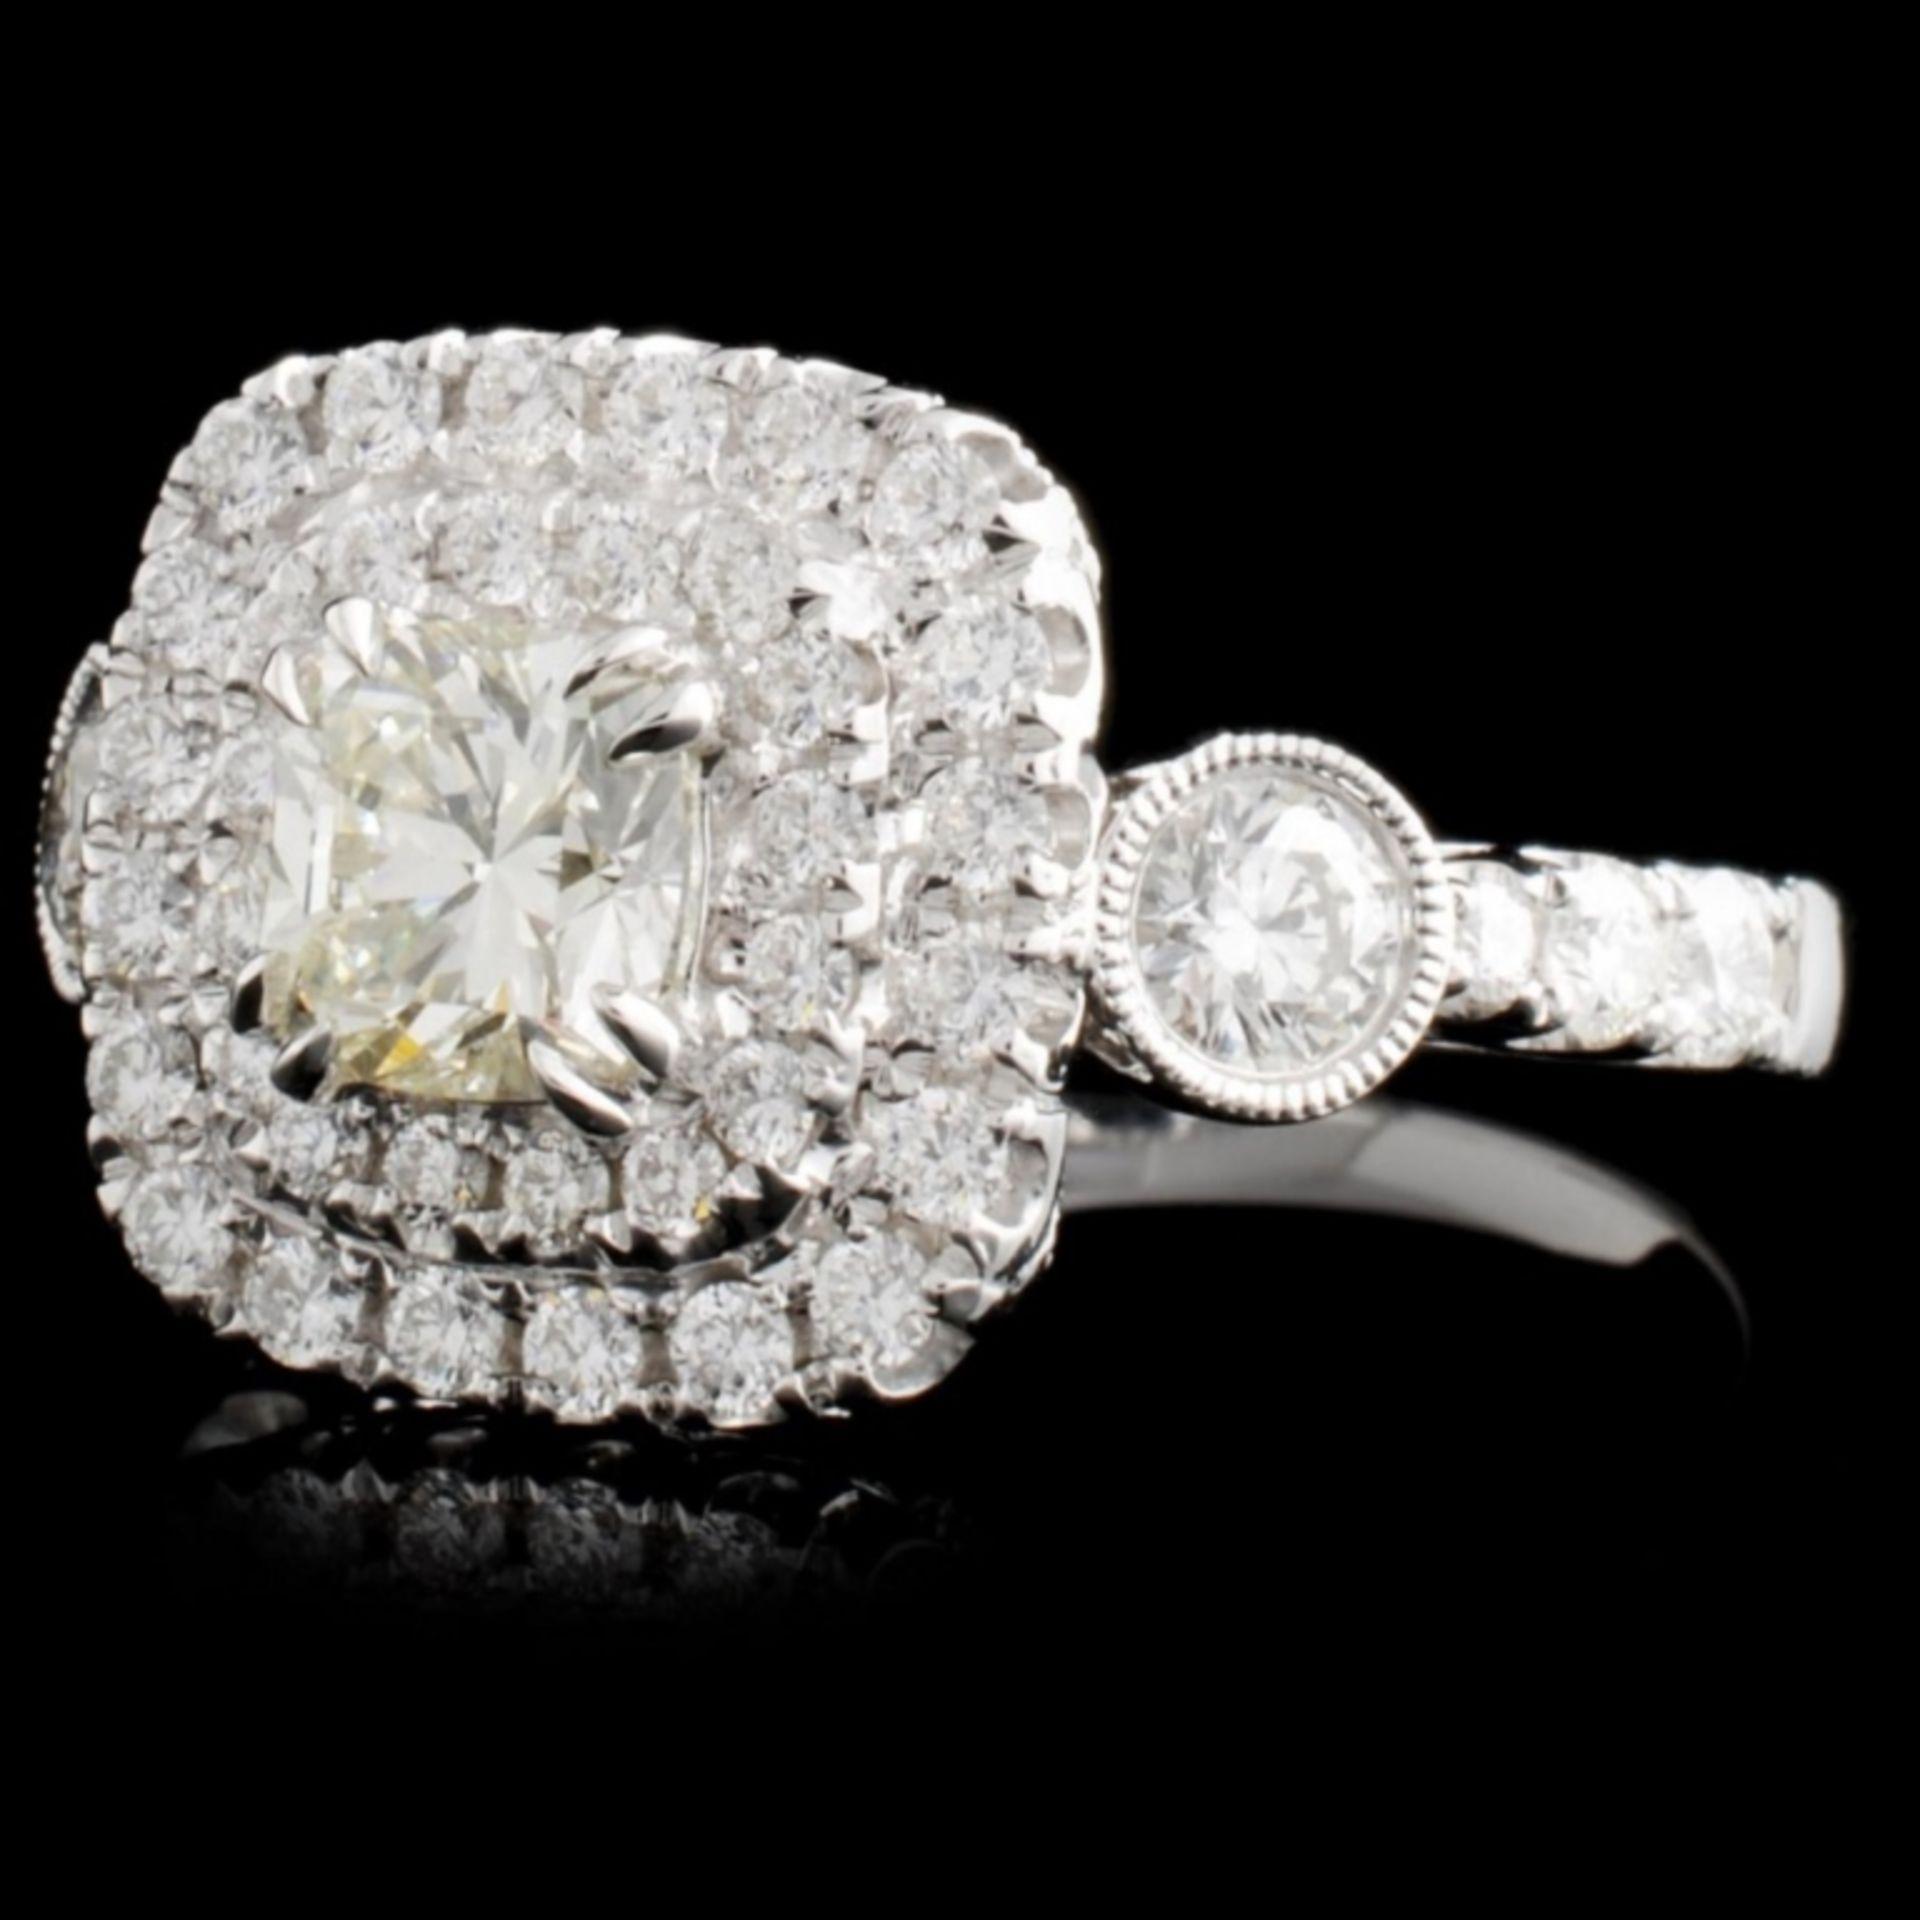 18K White Gold 1.60ctw Diamond Ring - Image 2 of 4